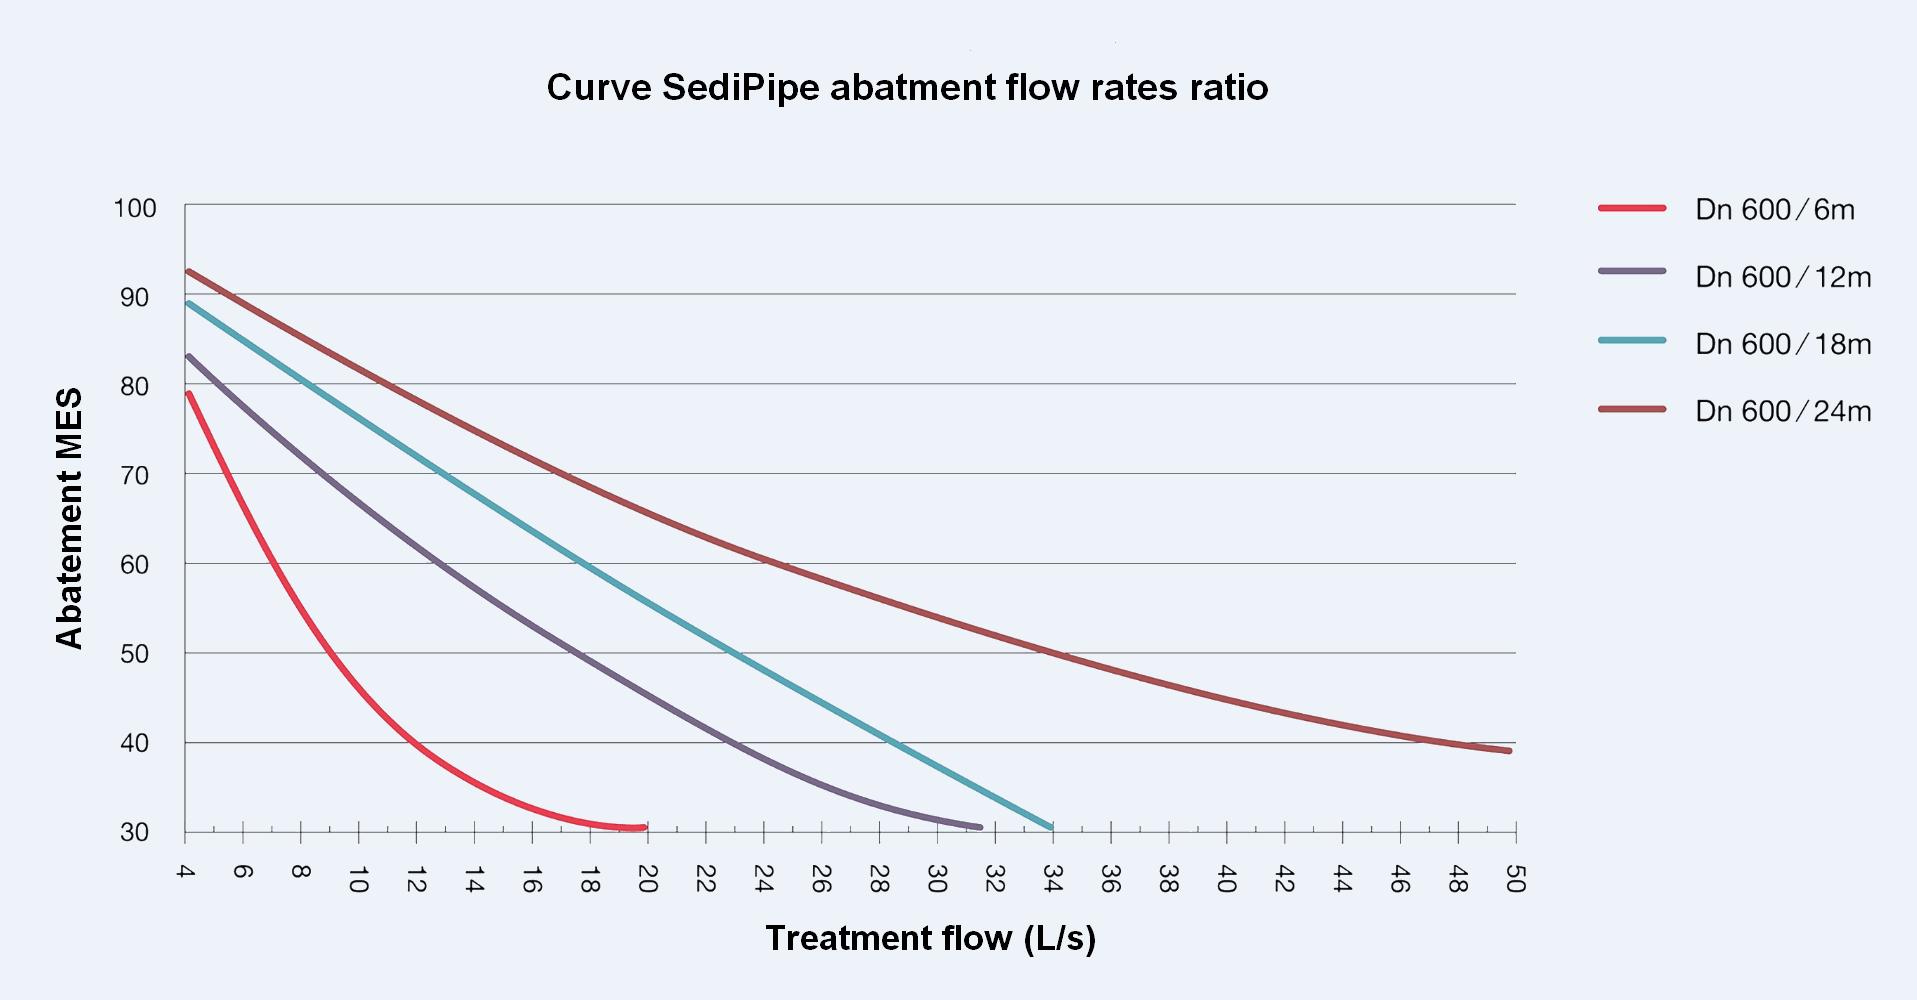 SediPipe abatment flow